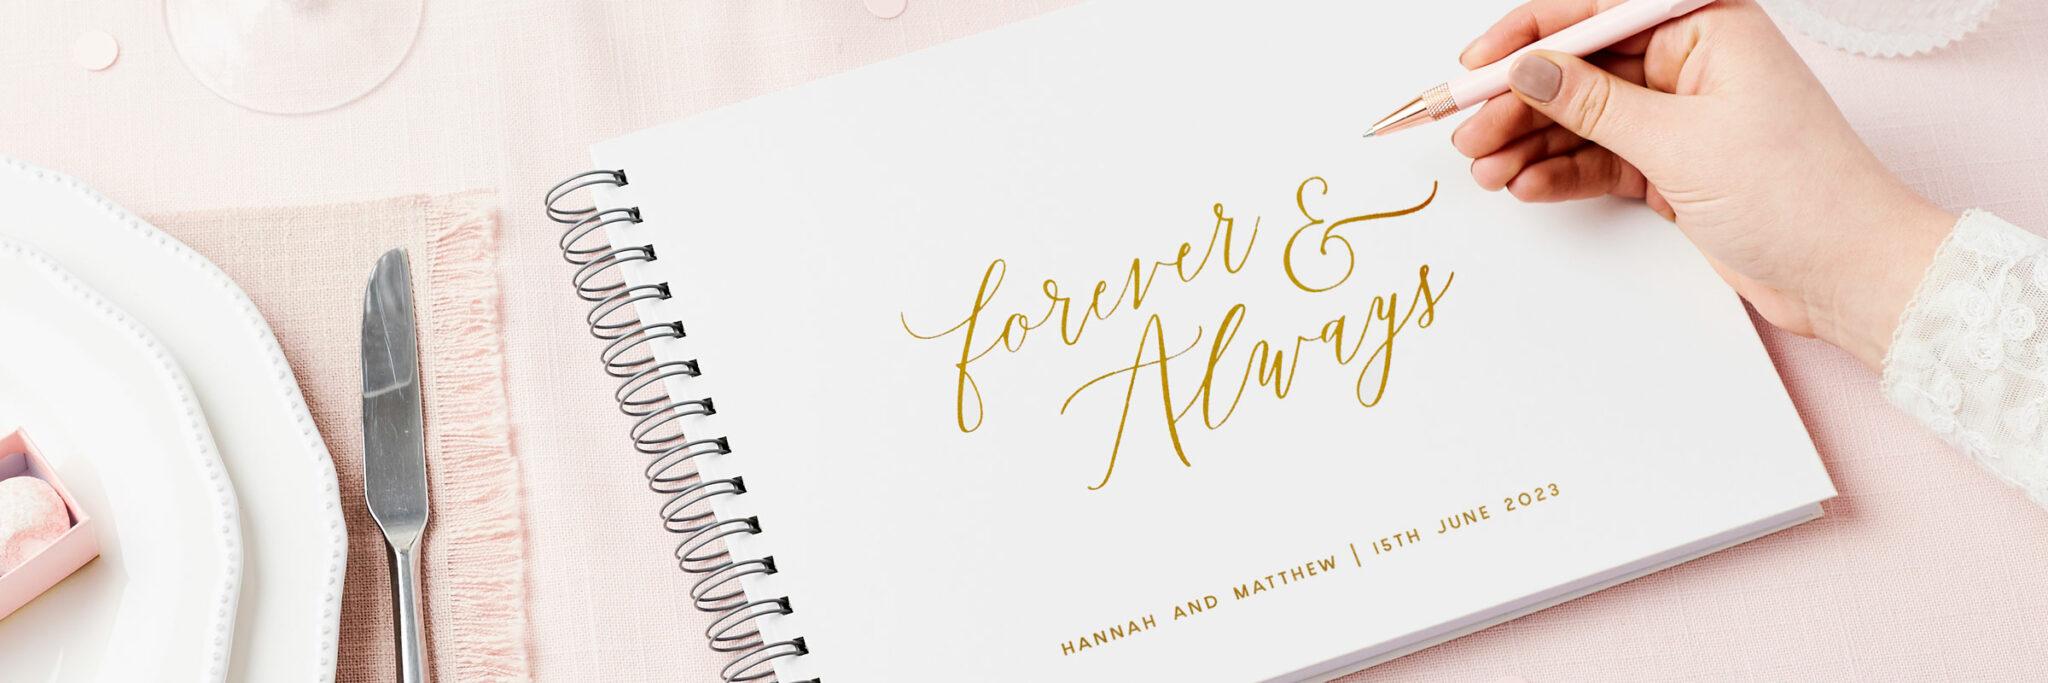 Martha Brook Personalised Wedding Guest Books